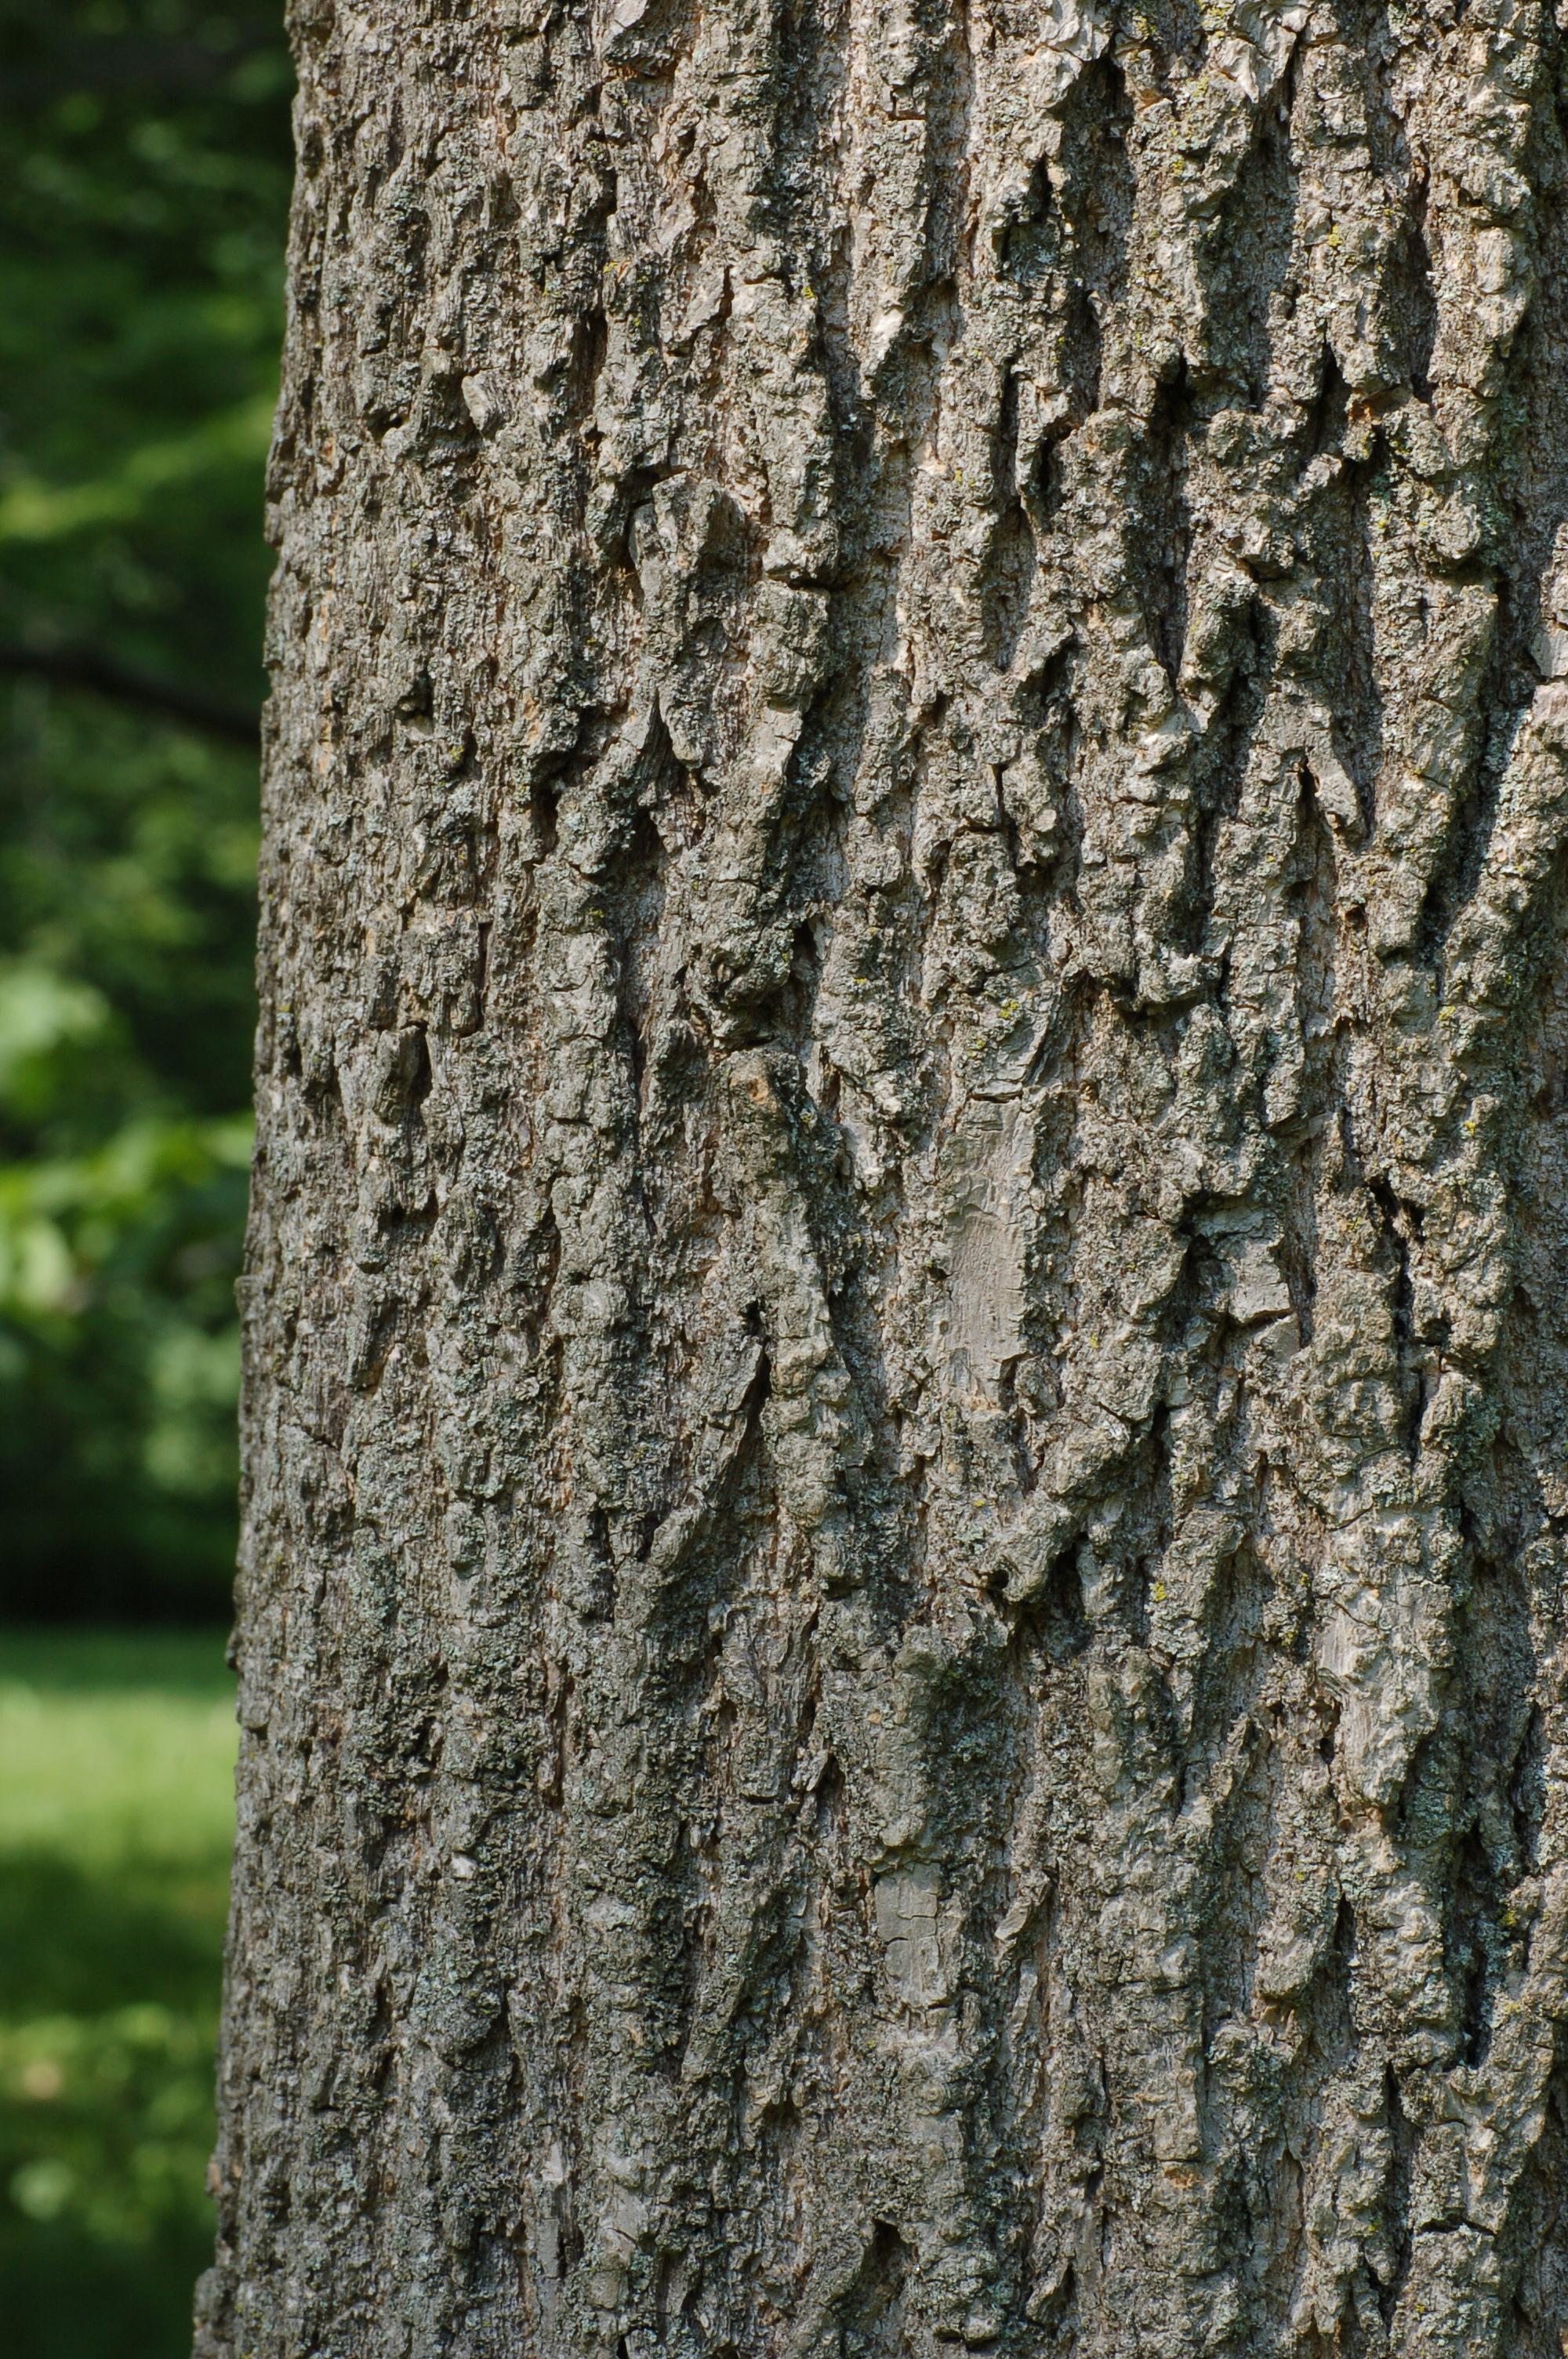 Green Ash Tree Bark